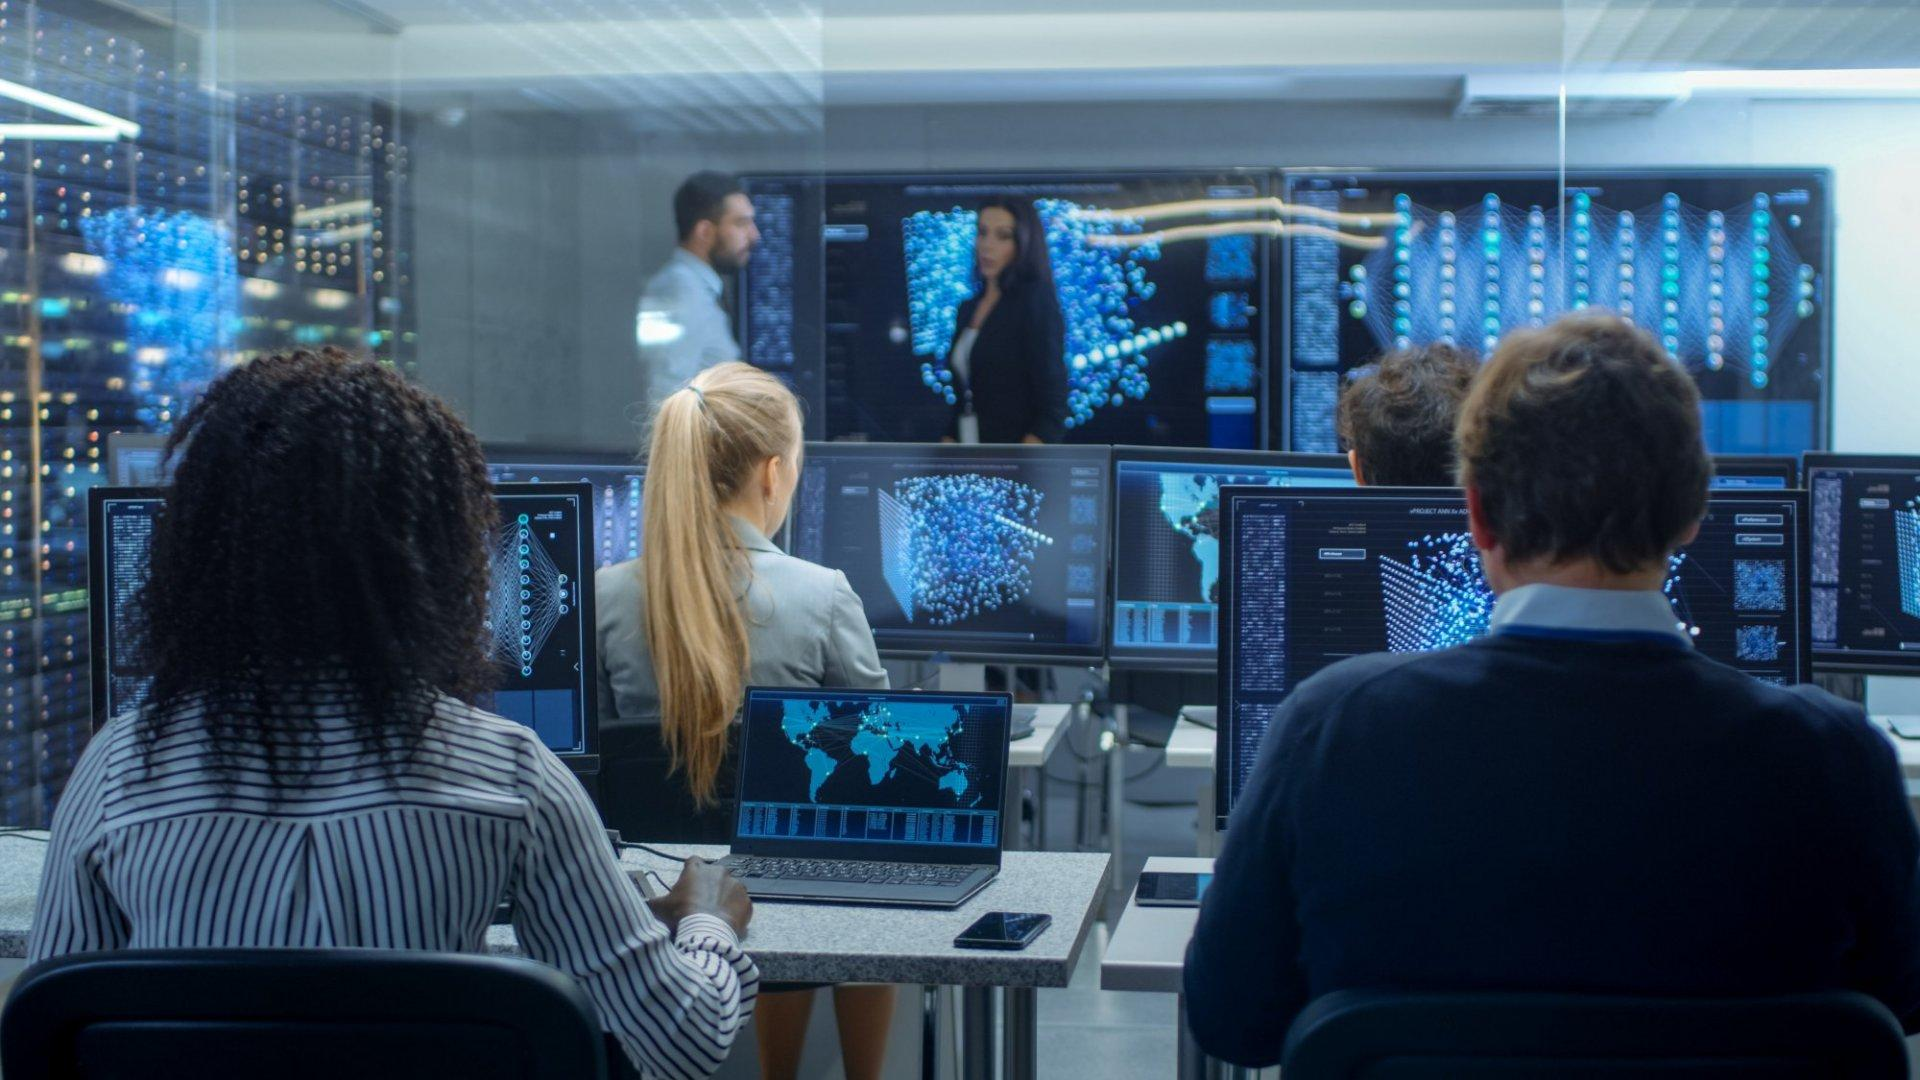 Atechup © Smart Cybersecurity Entrepreneurship ™ Certification Dallas